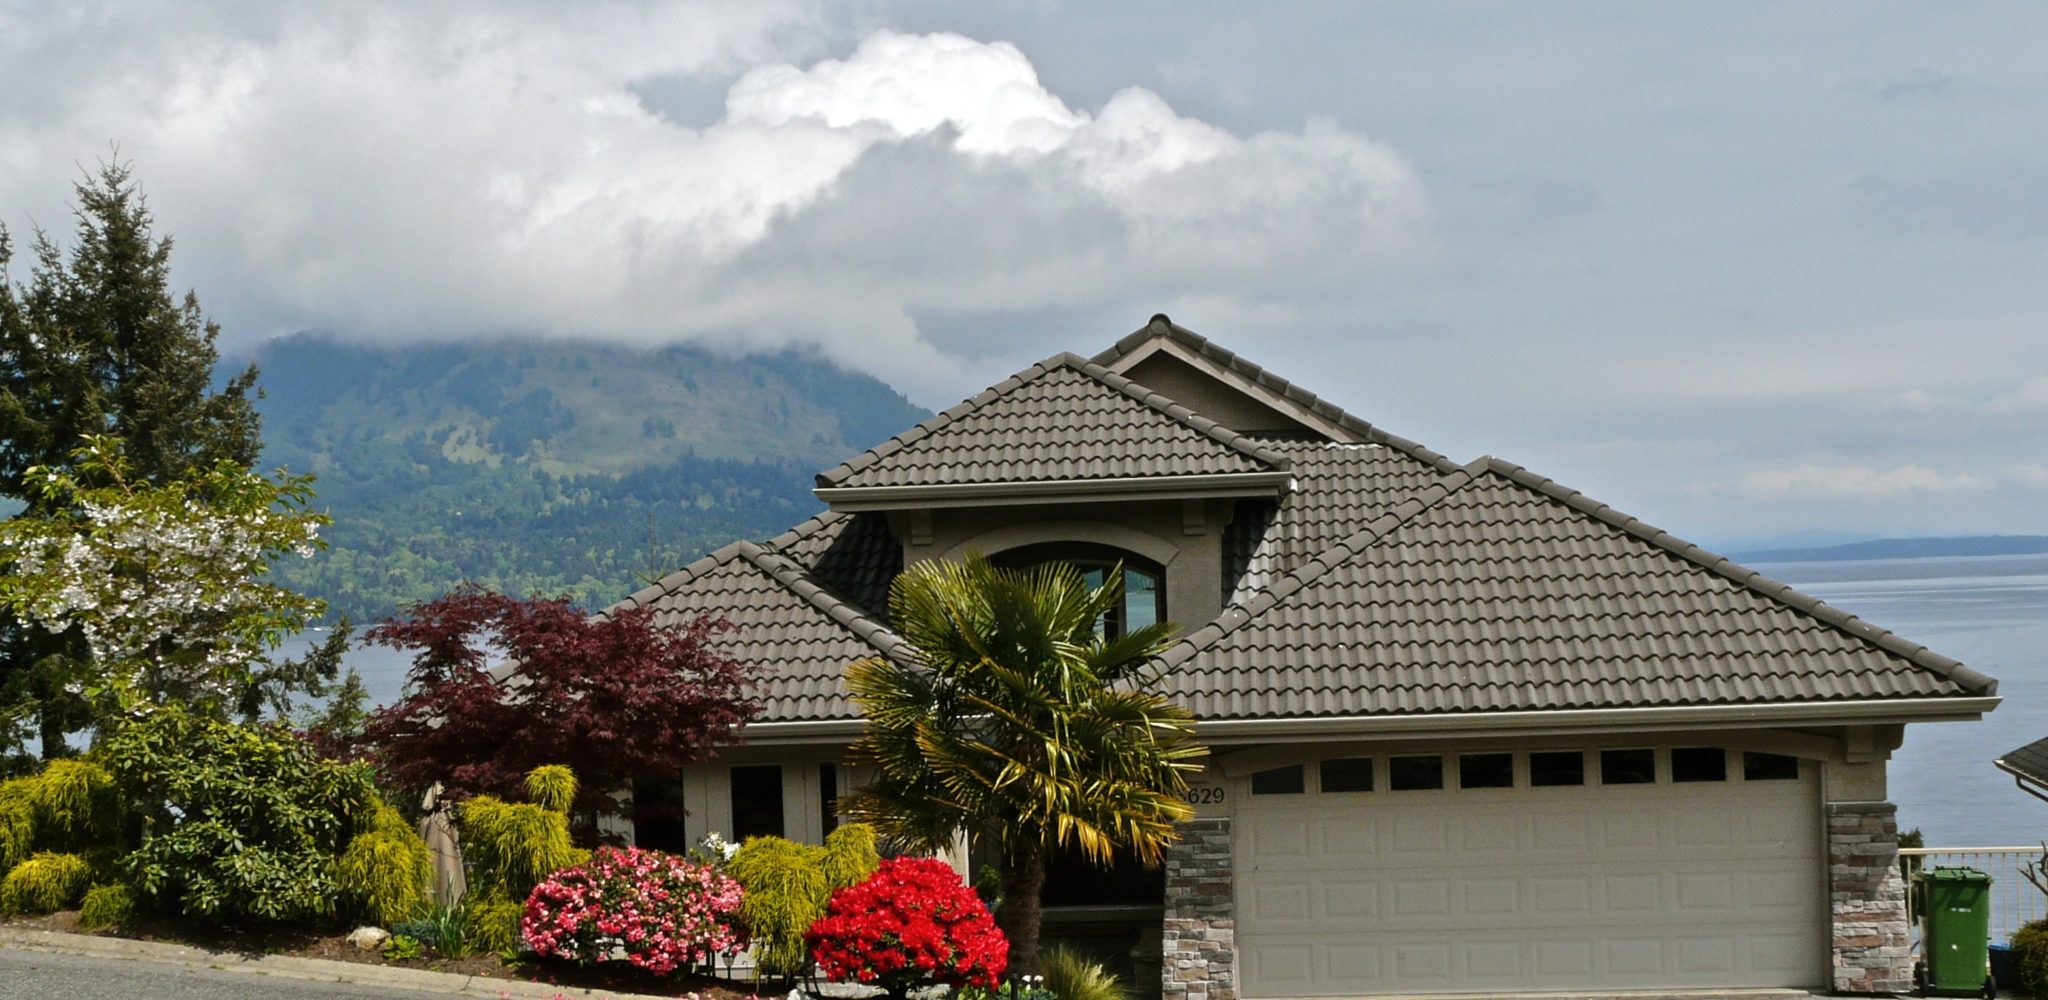 Real Estate - Active Adult Retirement Community - Cobble Hill, B C